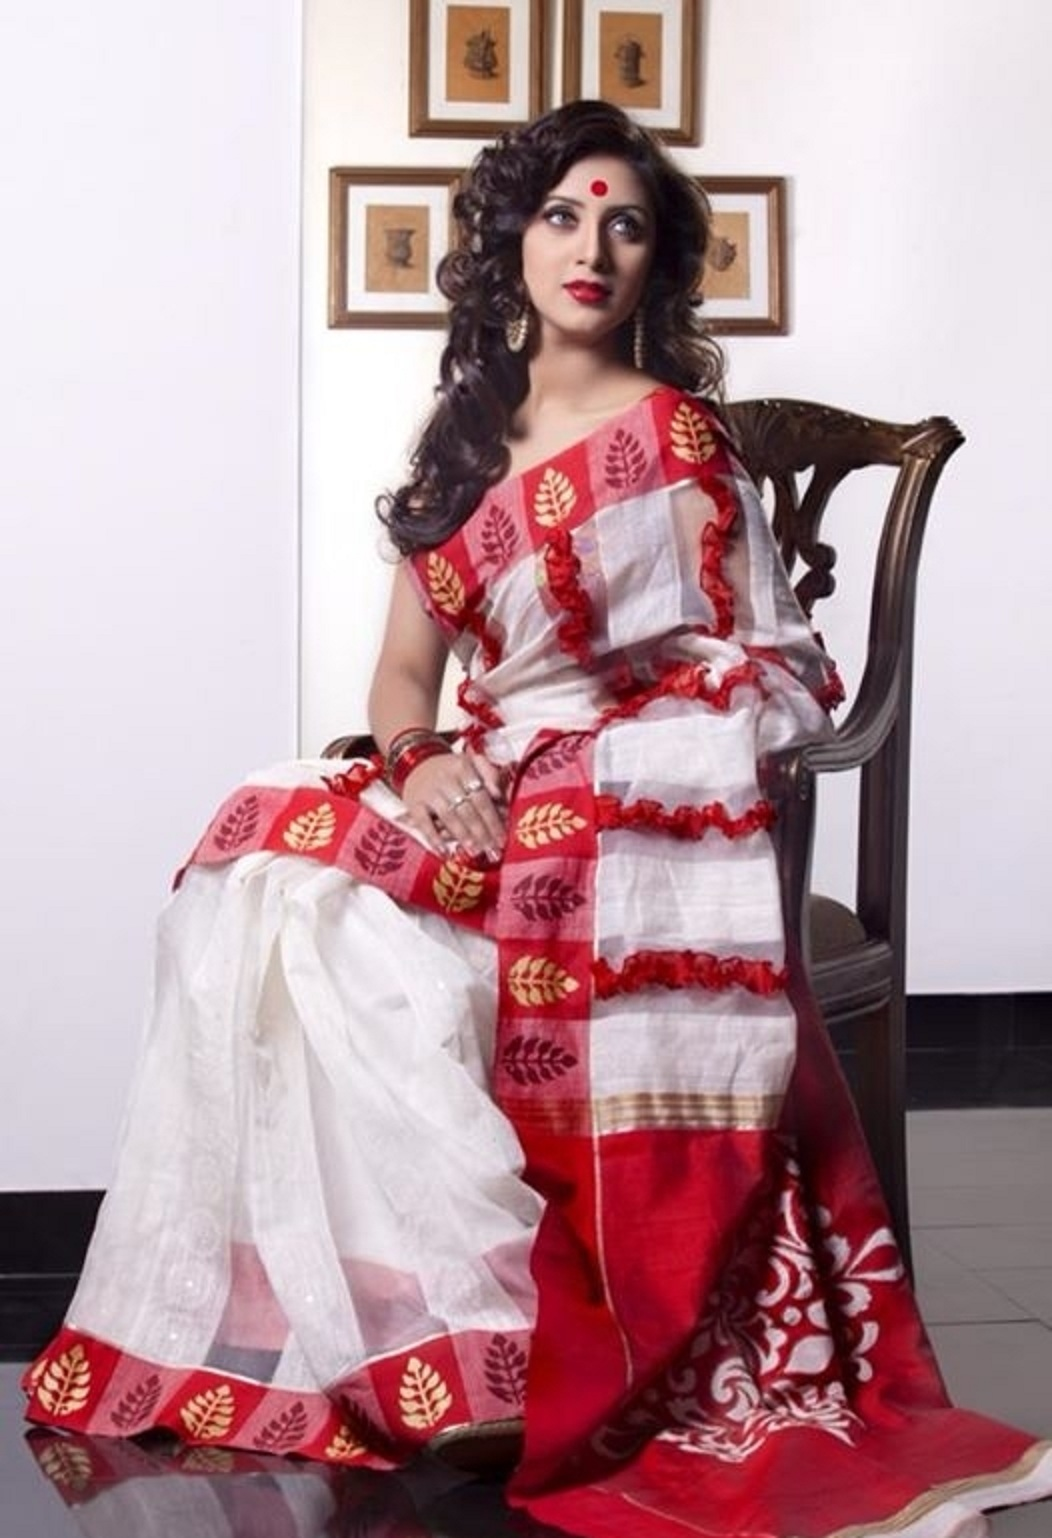 Cool Stylish Girl Hd Wallpaper Bidya Sinha Saha Mim Images Hd Wallpaper All 4u Wallpaper